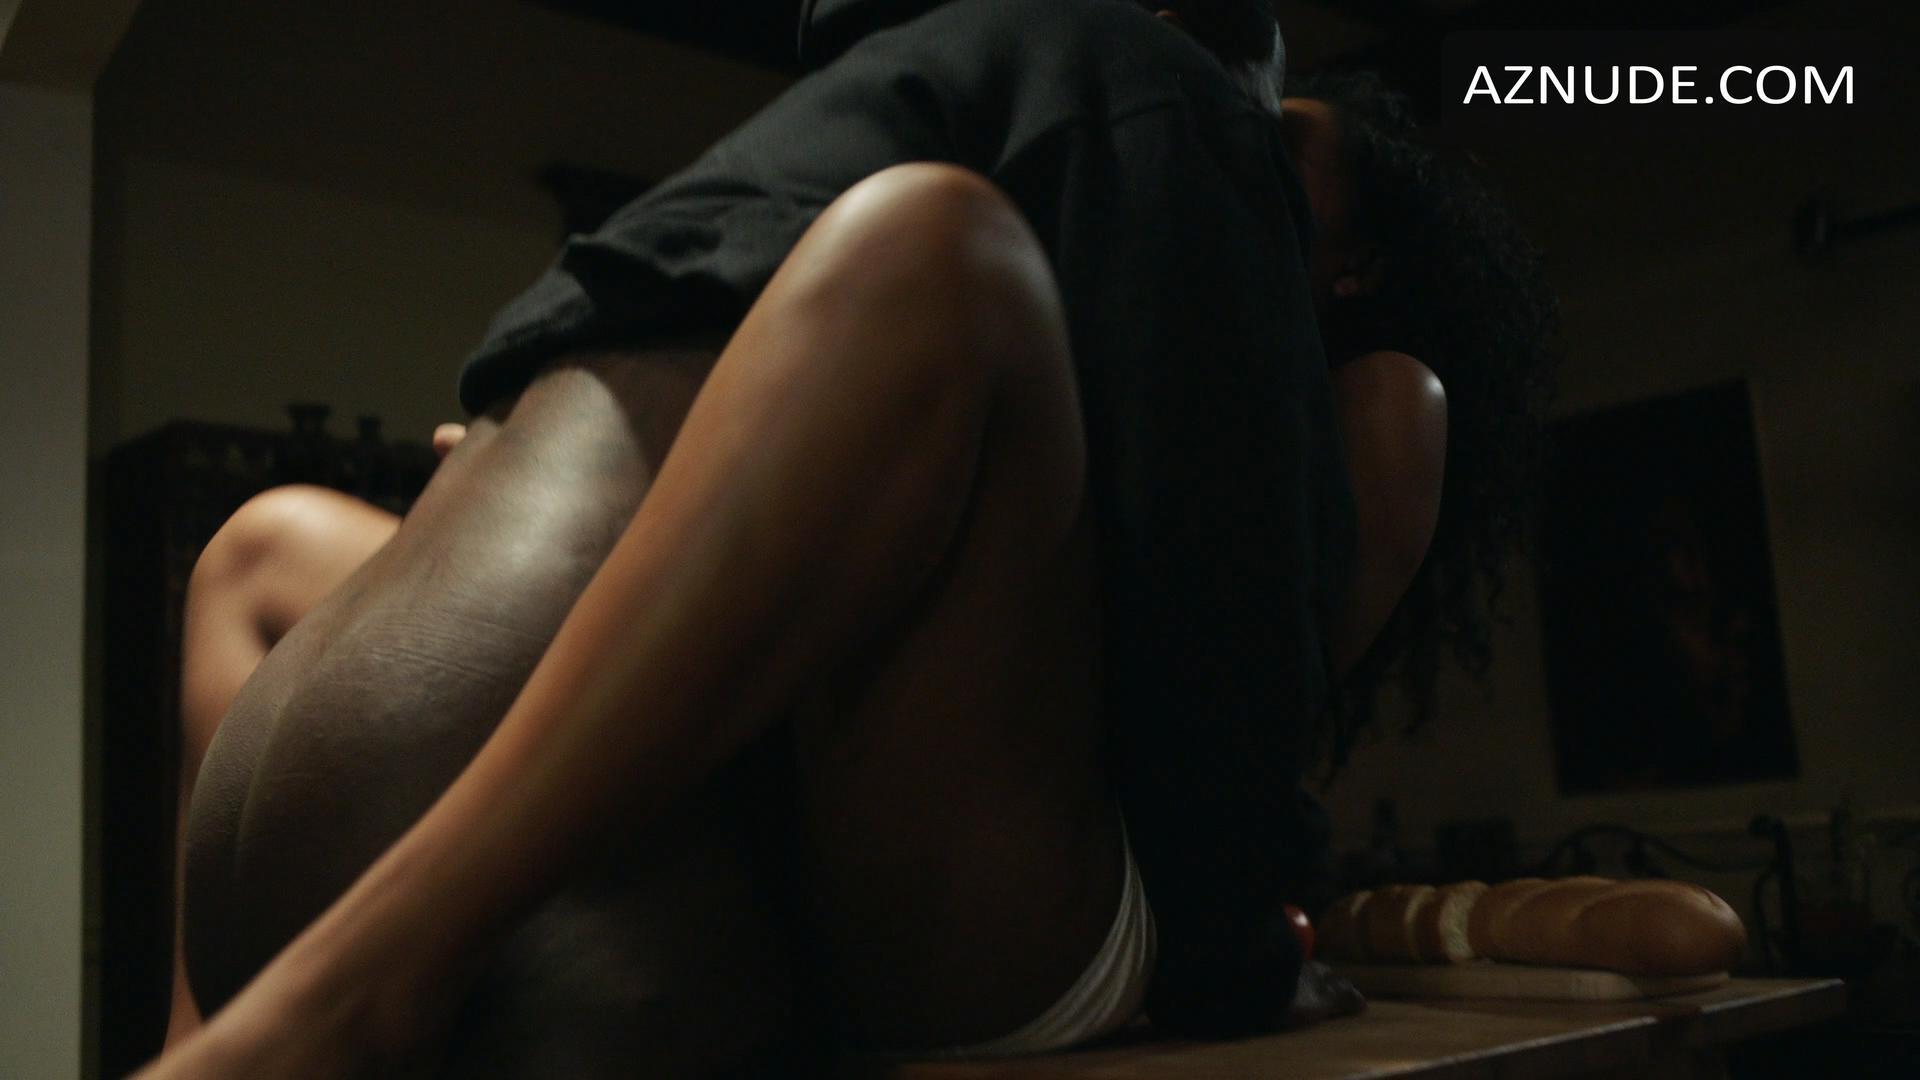 50 Cent Video Porno 50 cent nude - aznude men